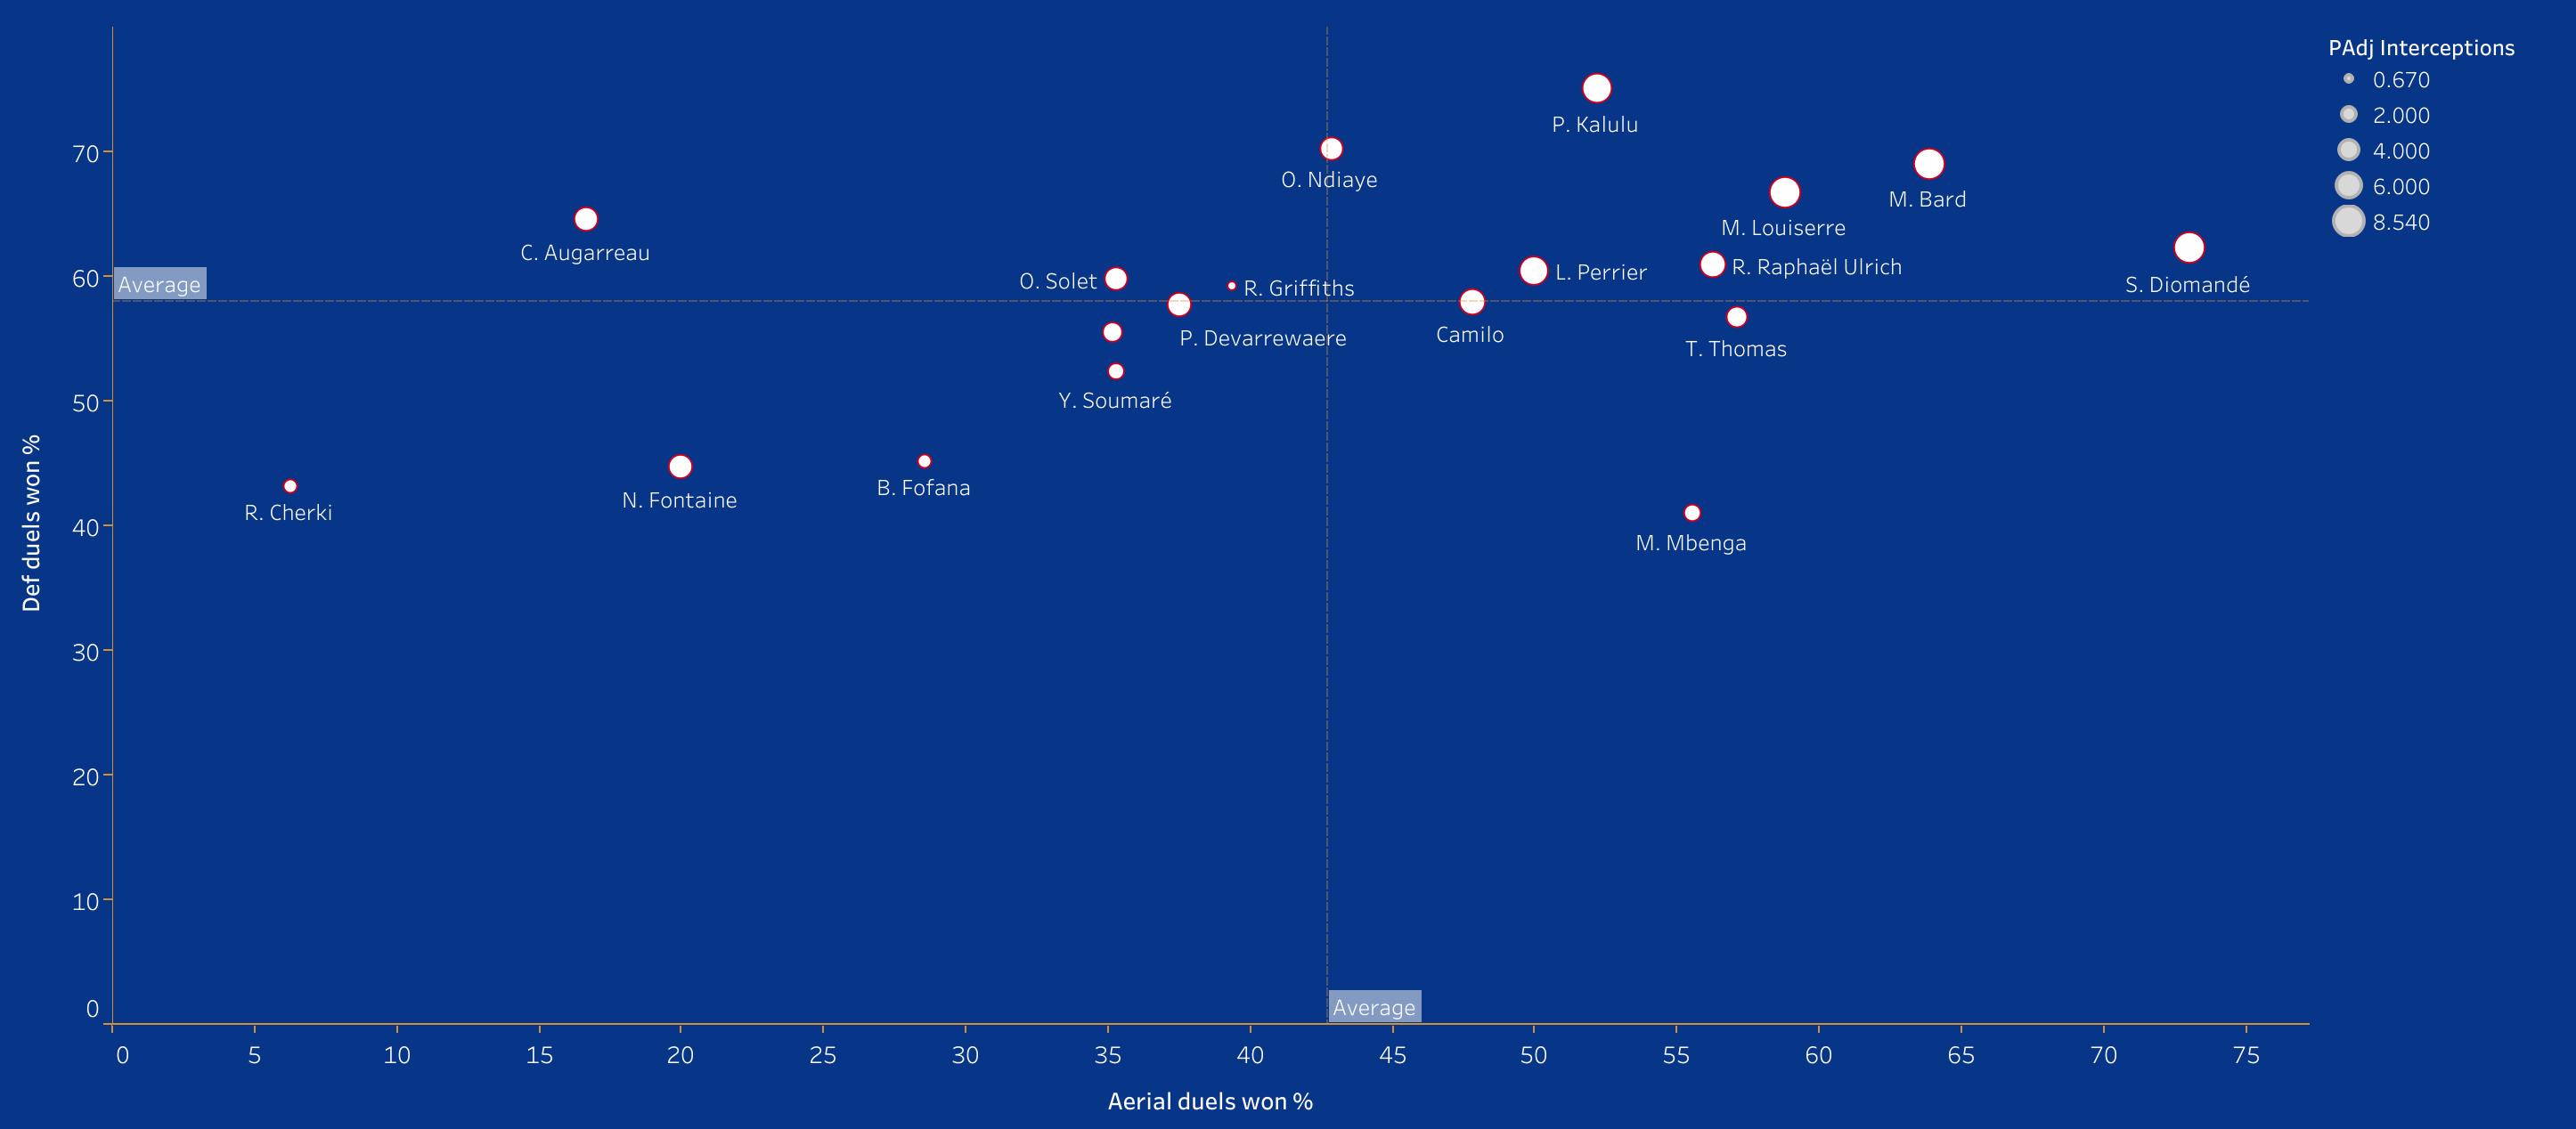 Scouting Lyon's academy - data analysis statistics